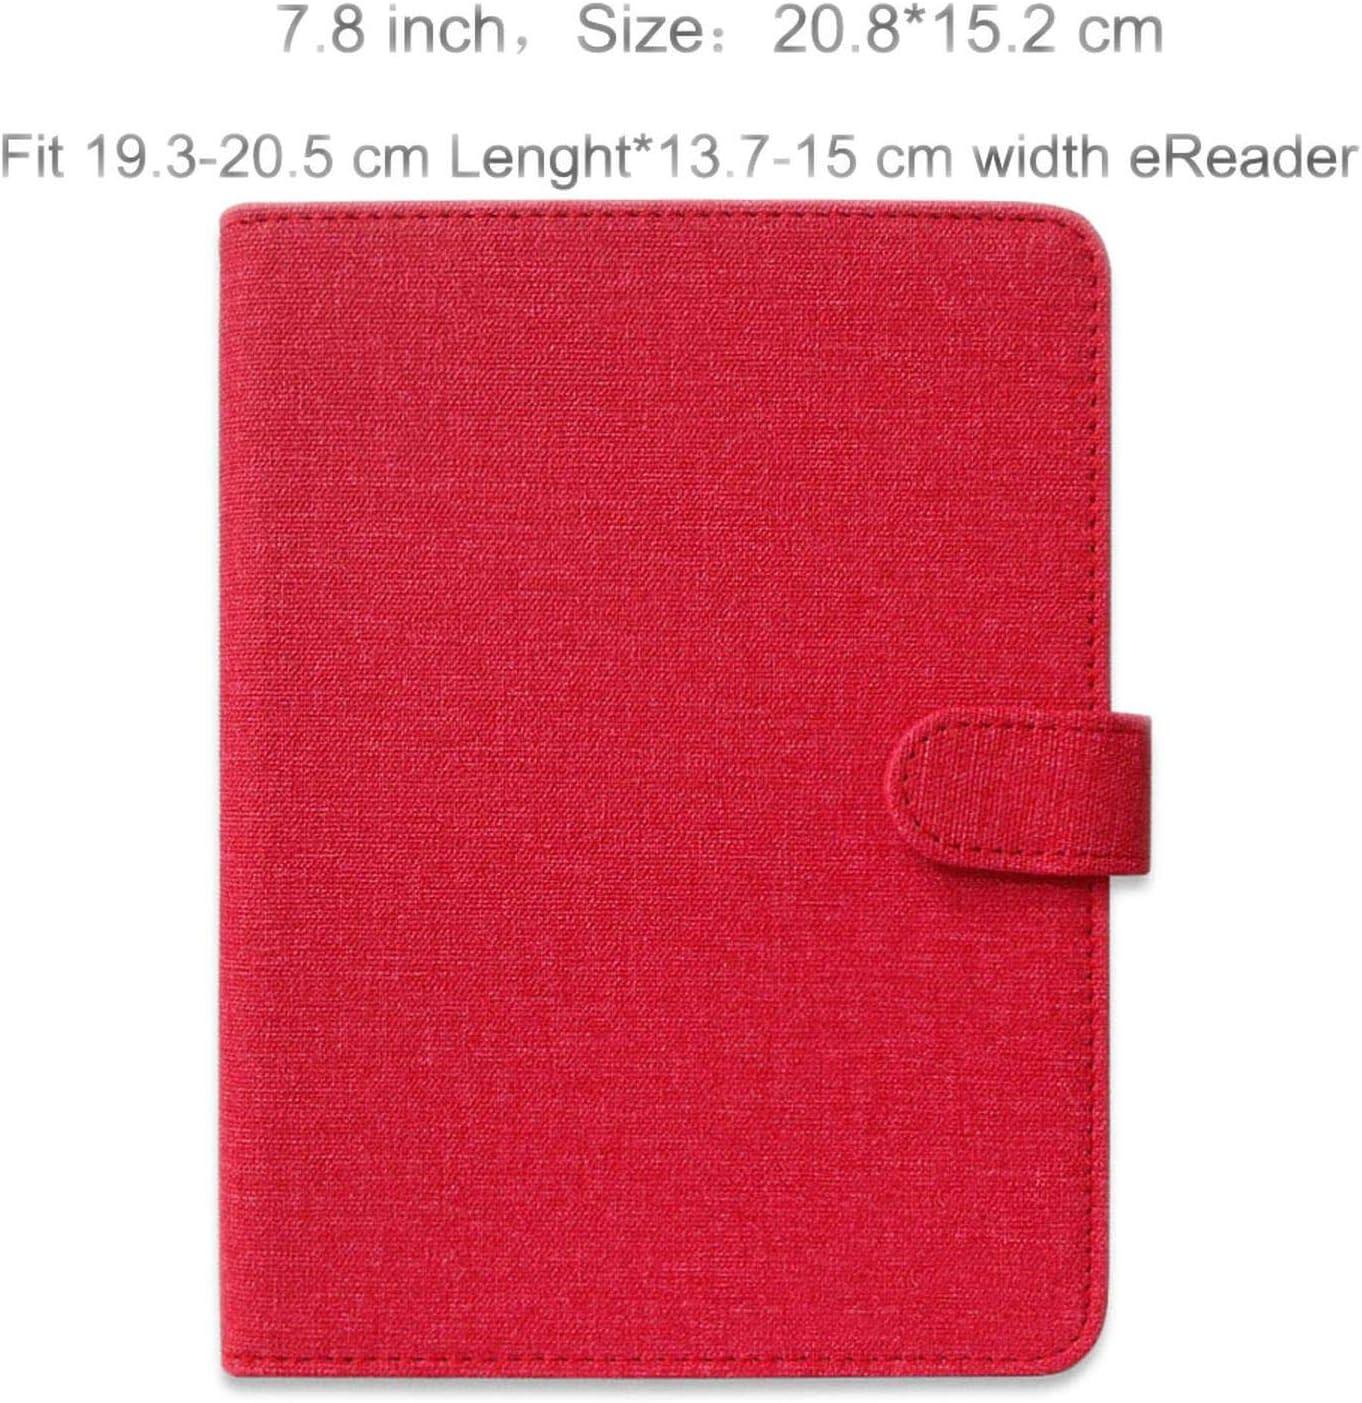 6 6.8 7.8 Pulgadas Ereader Funda para E Book Cover para Onyx ...